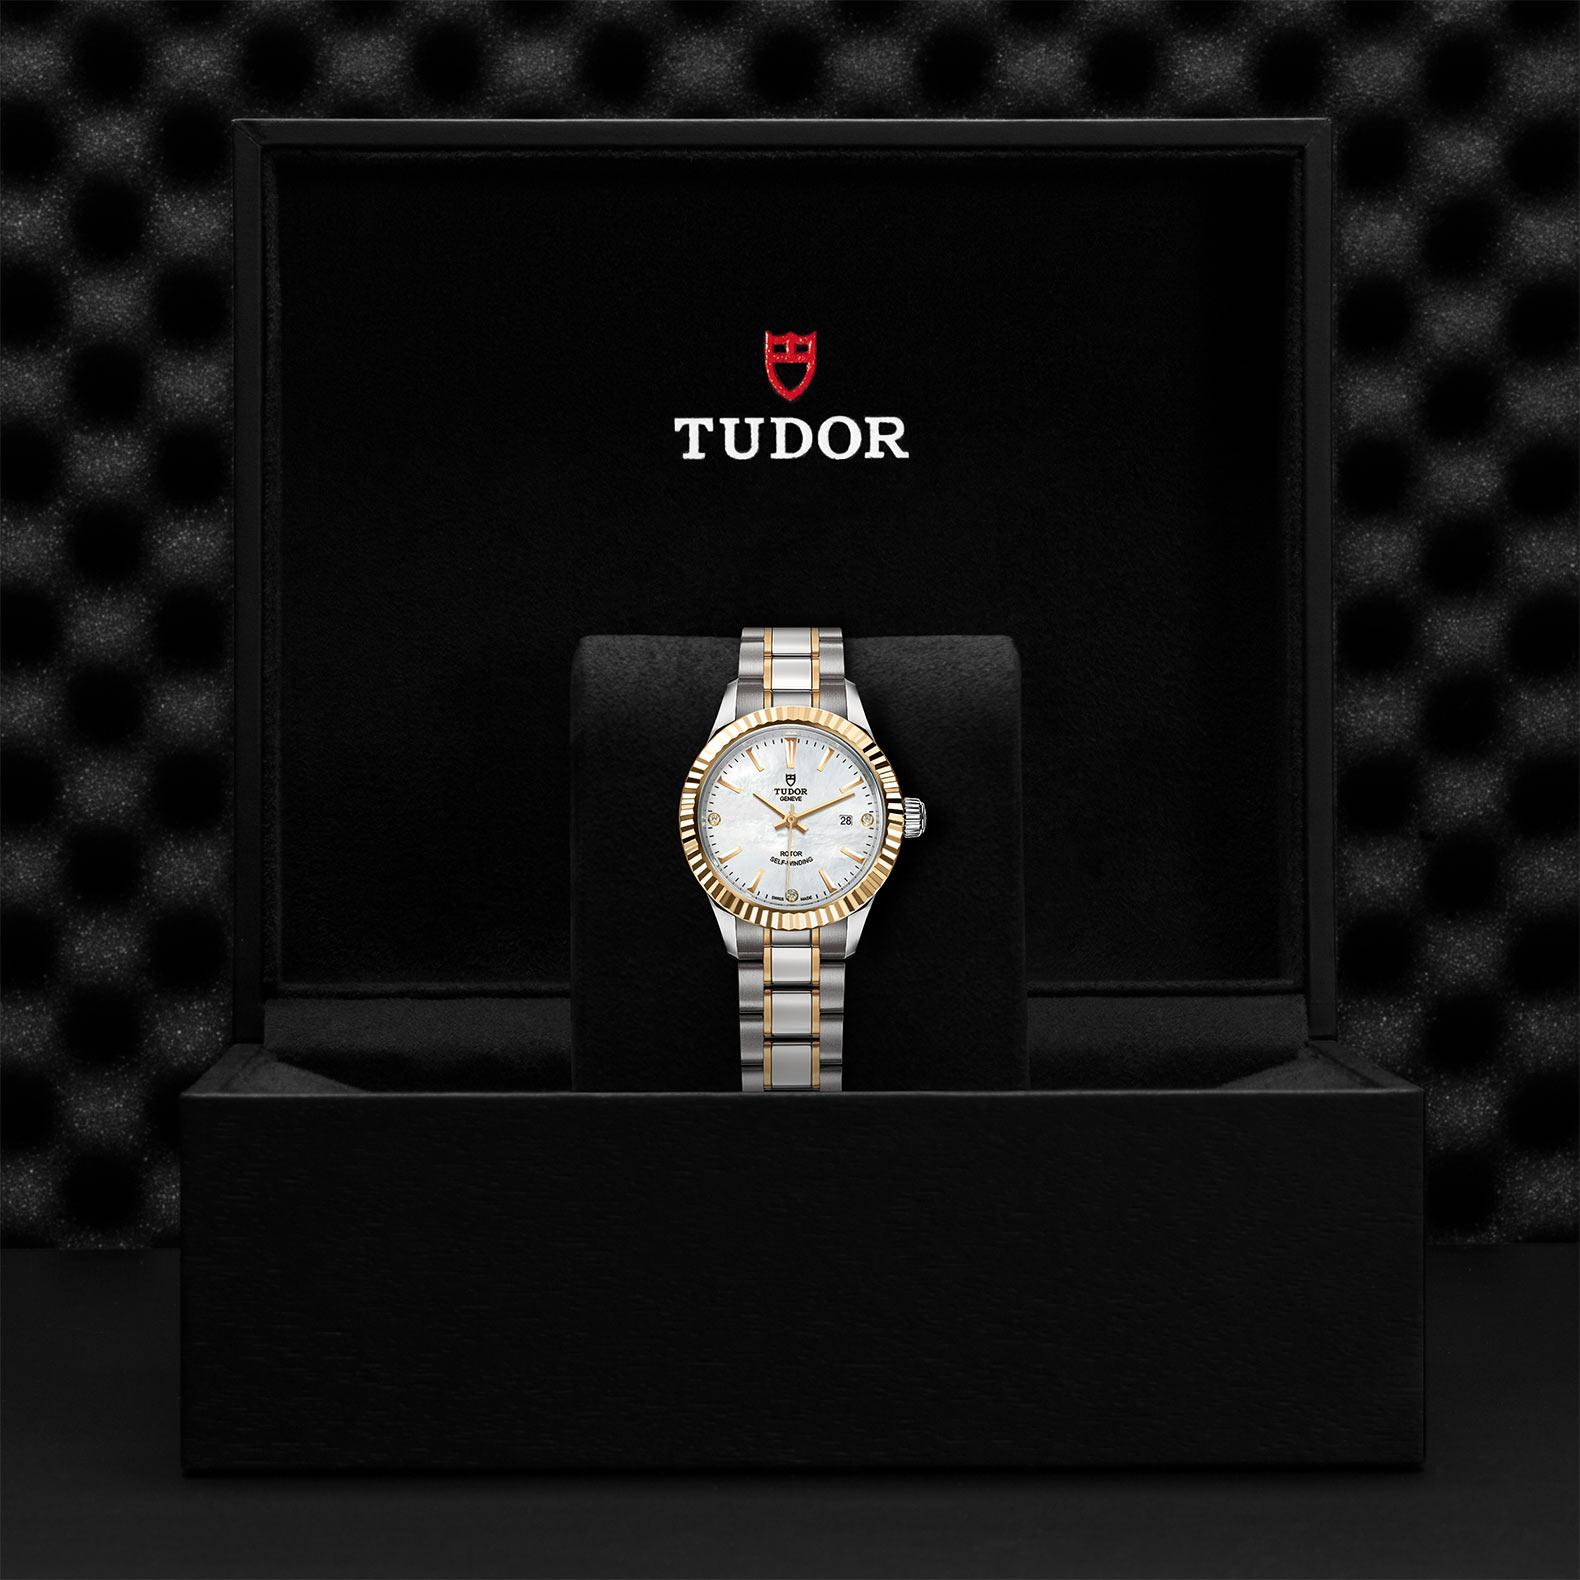 TUDOR Style M12113 0017 Presentation